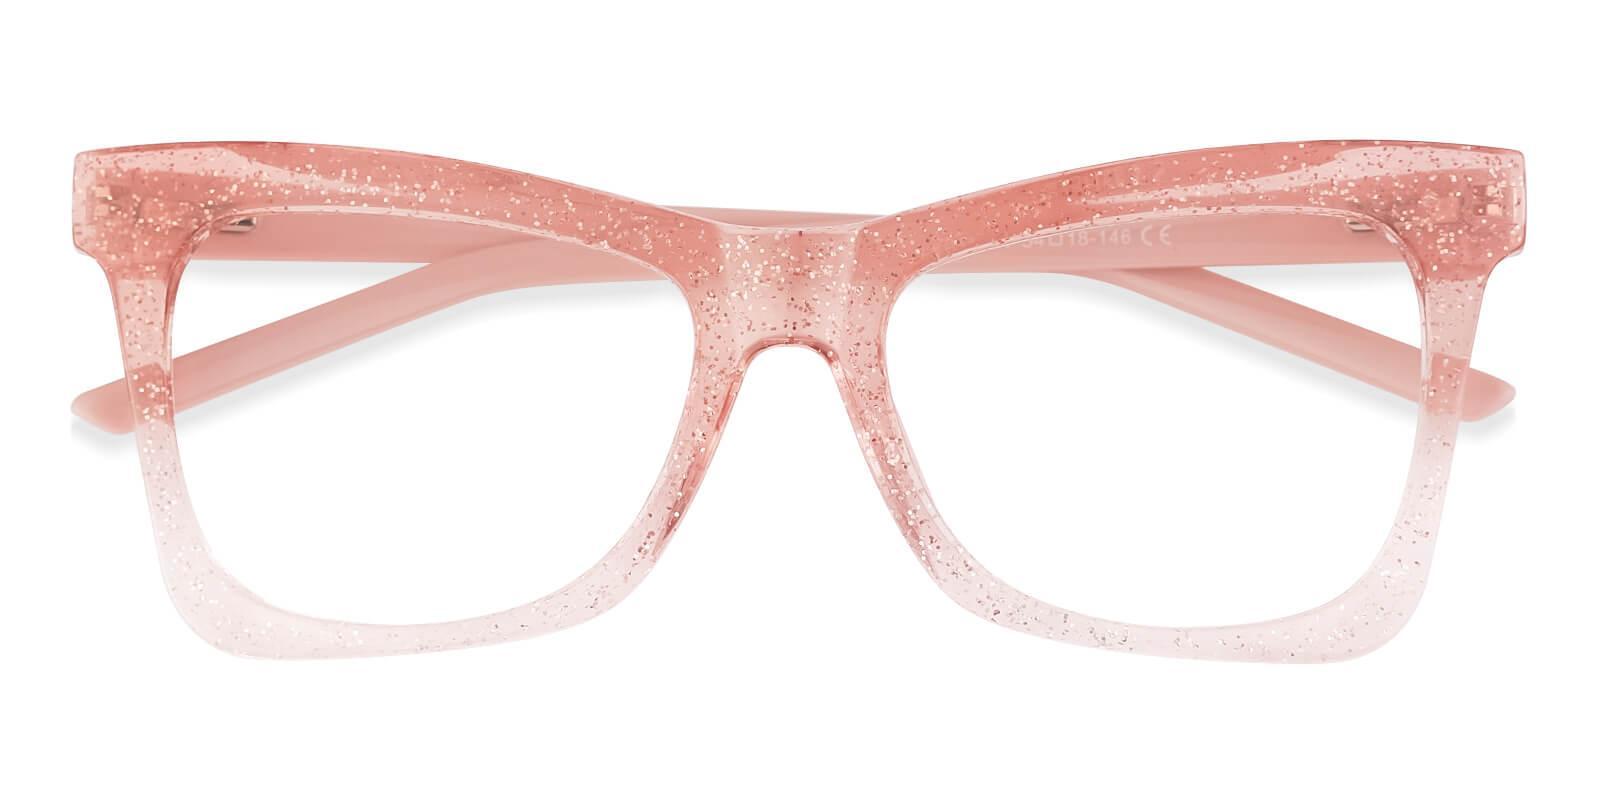 Tamara Pink TR Eyeglasses , Fashion , UniversalBridgeFit Frames from ABBE Glasses